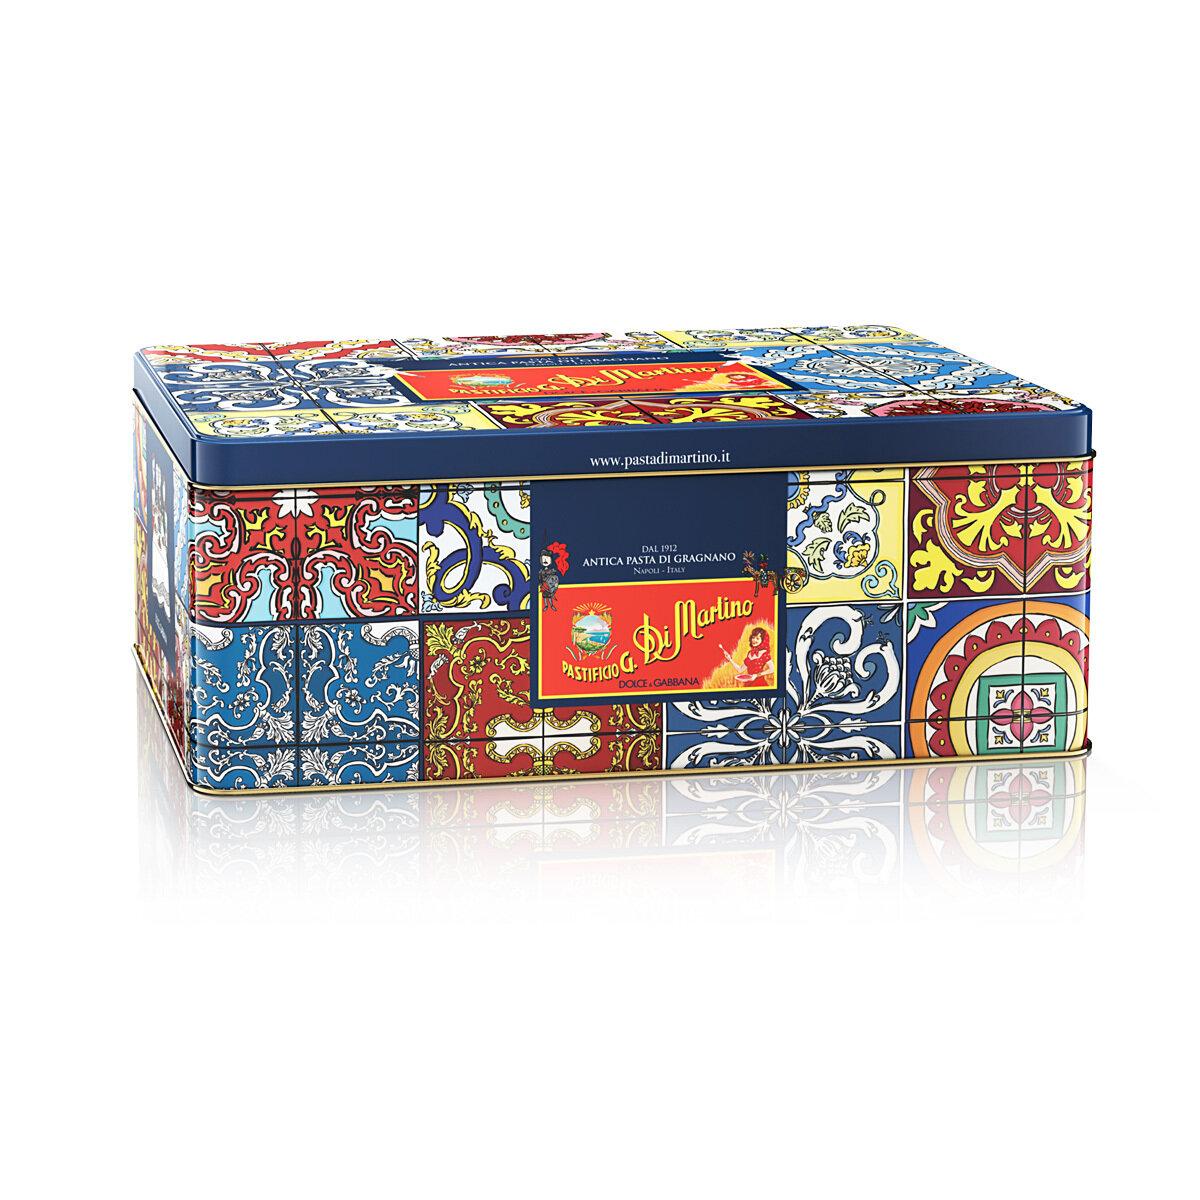 DOLCE & GABBANA AND DI MARTINO Erikoislahjapakkaus 5*500 G (+Esiliina) | Gift Box 5*500 G (+Apron) | METAL TIN